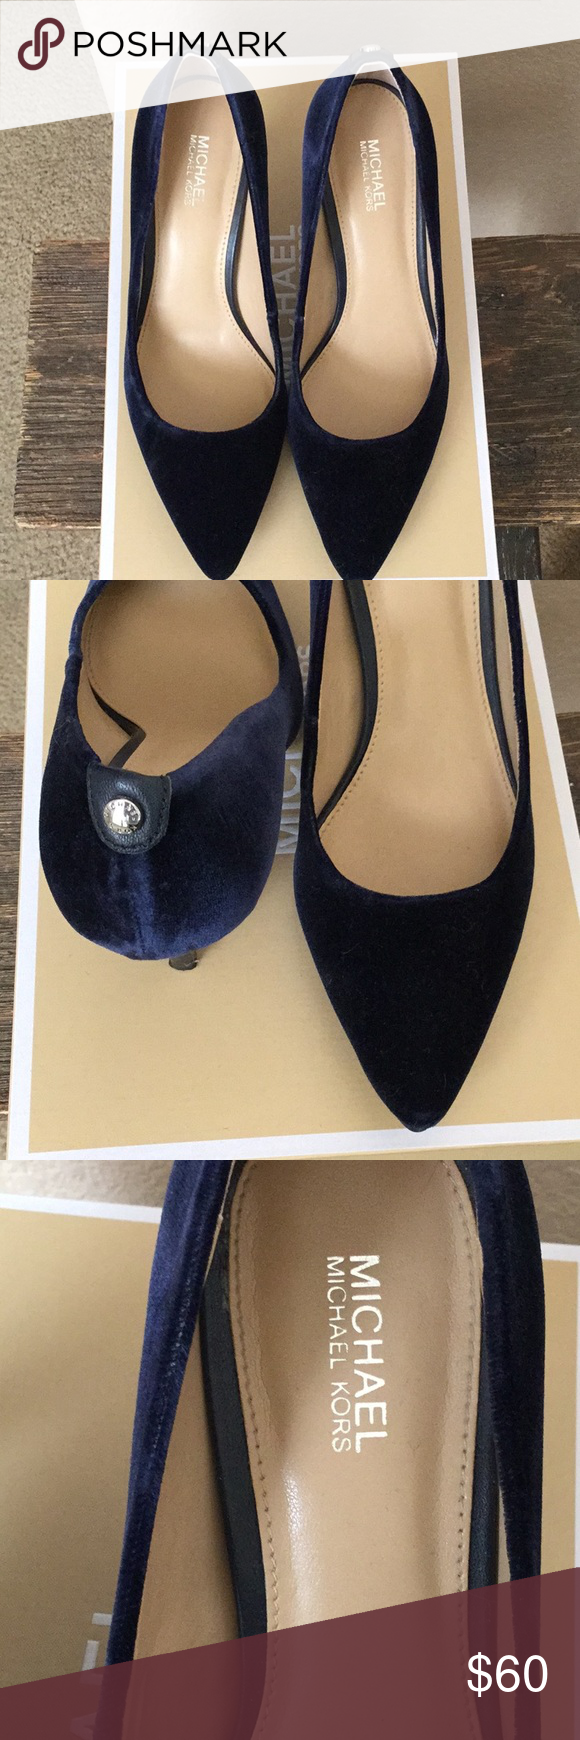 Velvet pumps, Michael kors shoes heels